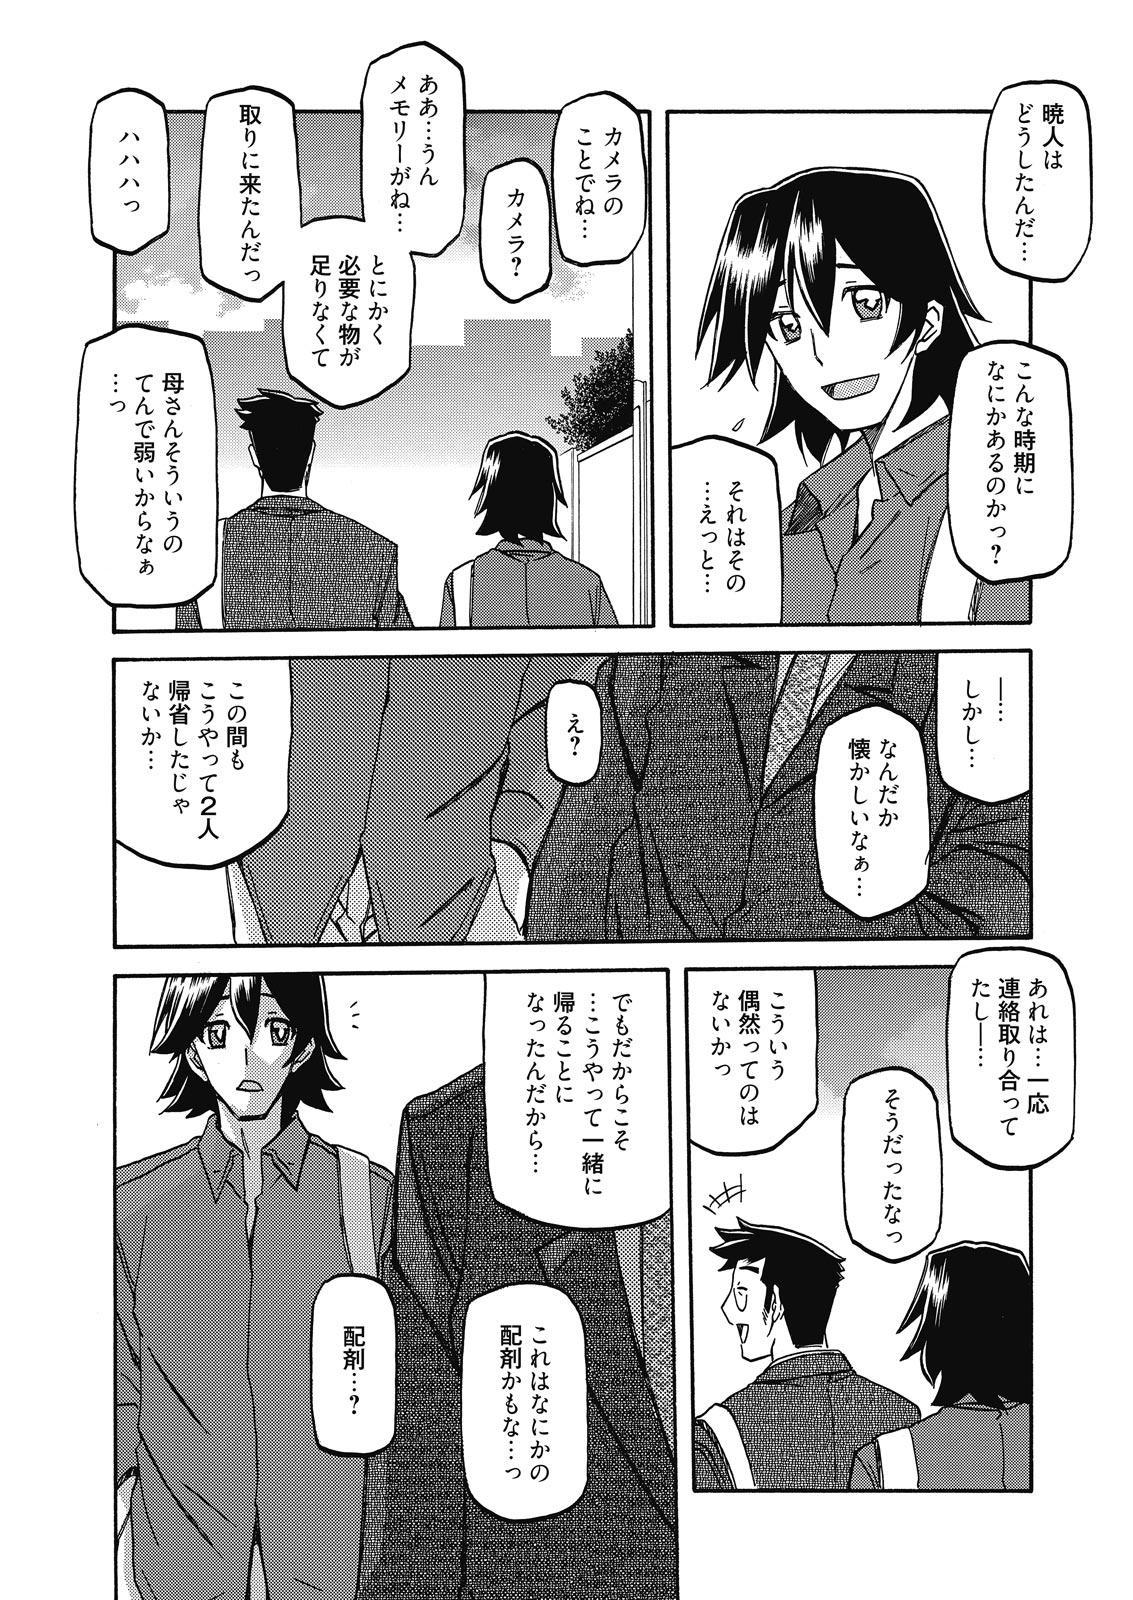 Web Manga Bangaichi Vol. 7 47